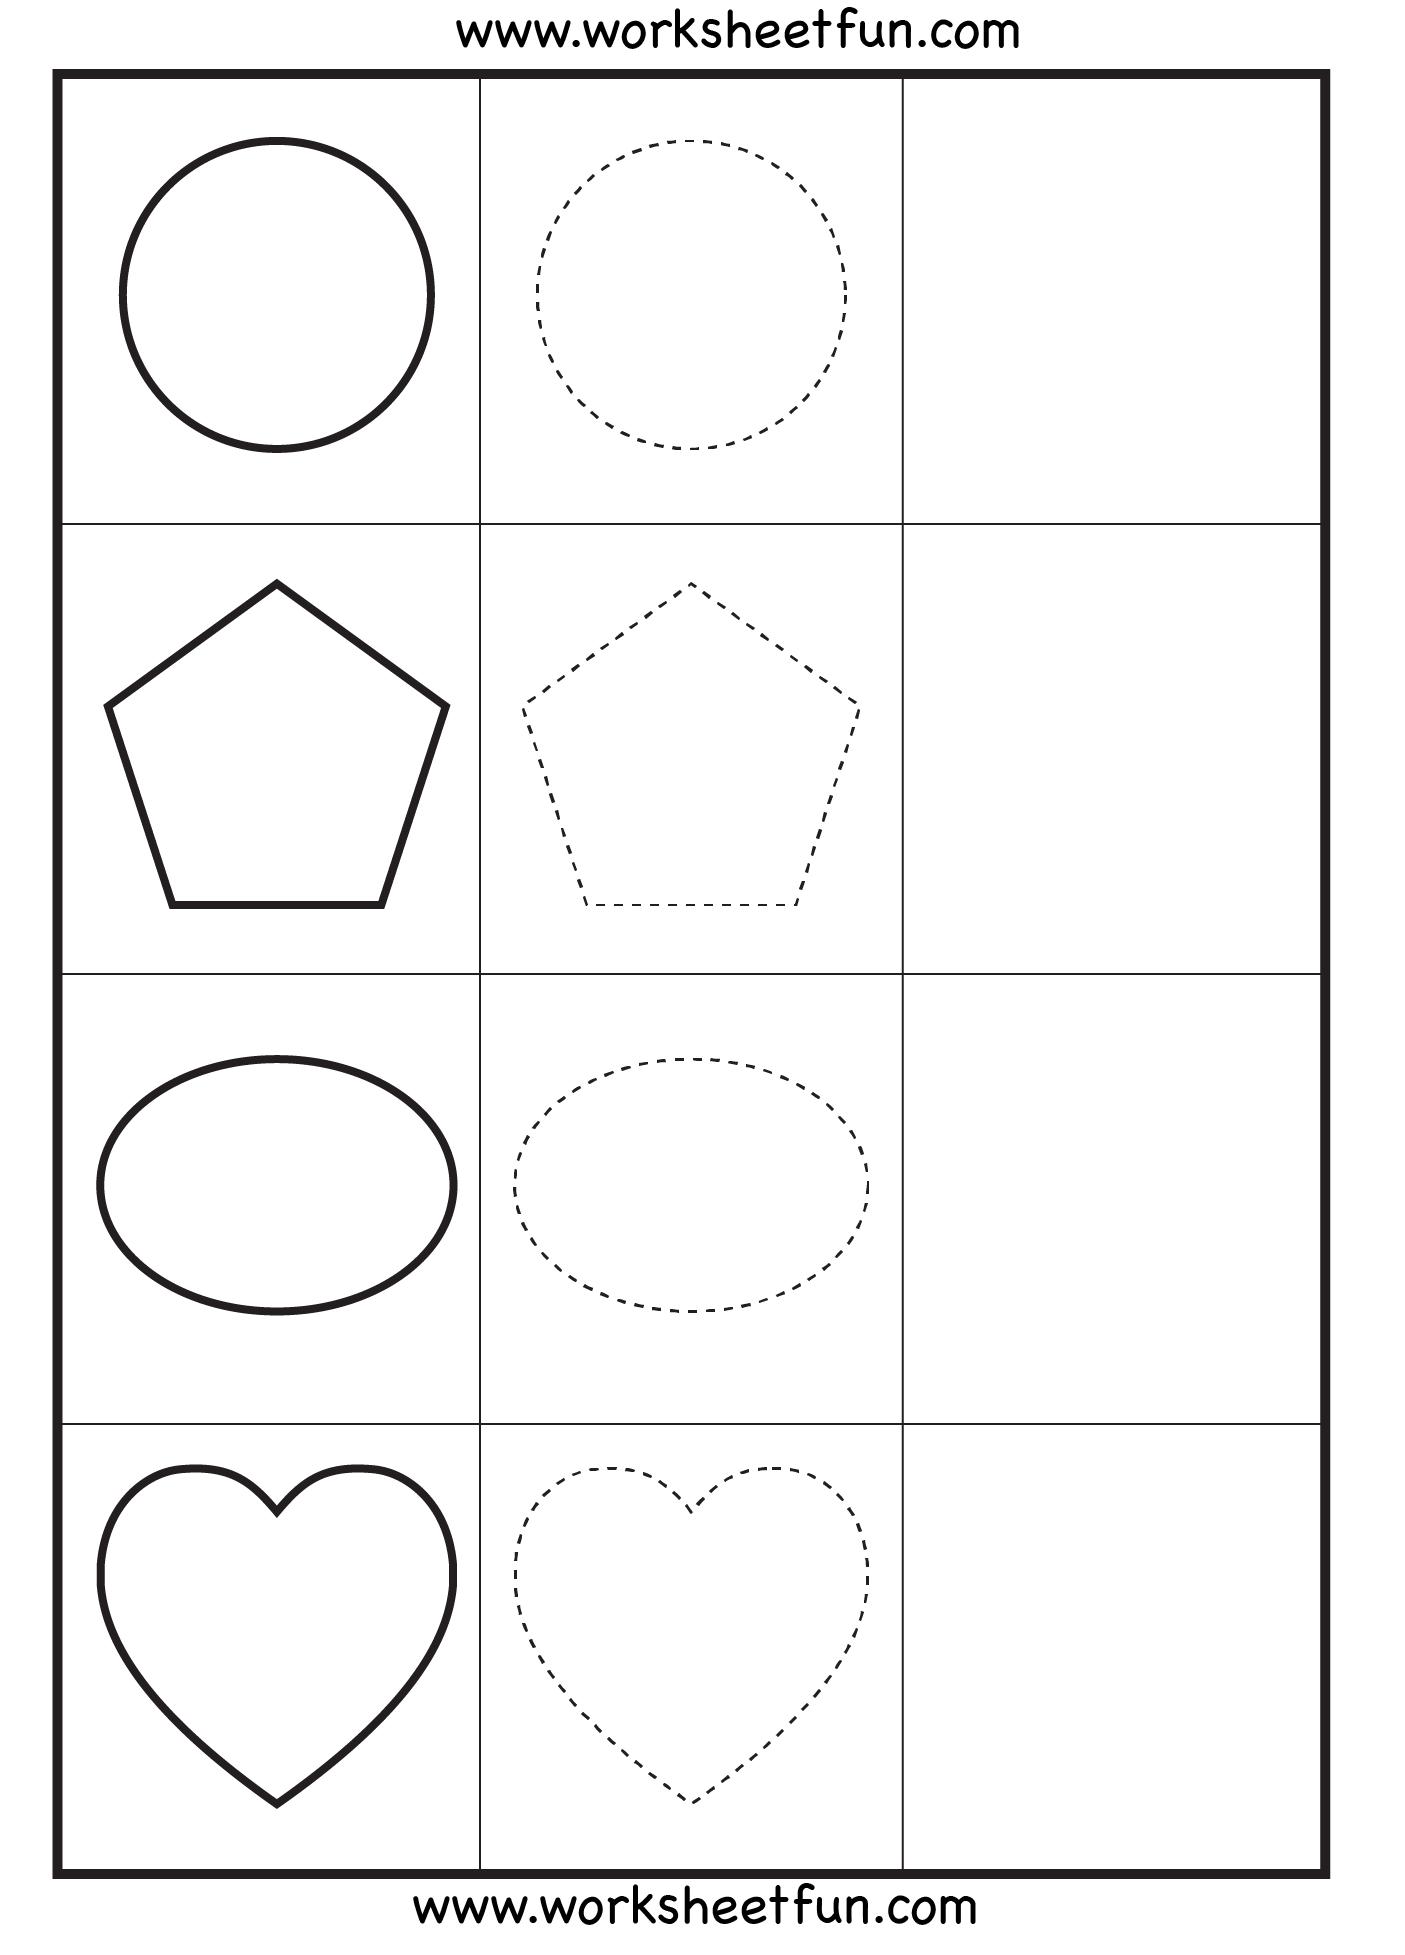 Shapes Tracing 3 Worksheets Printable Worksheets